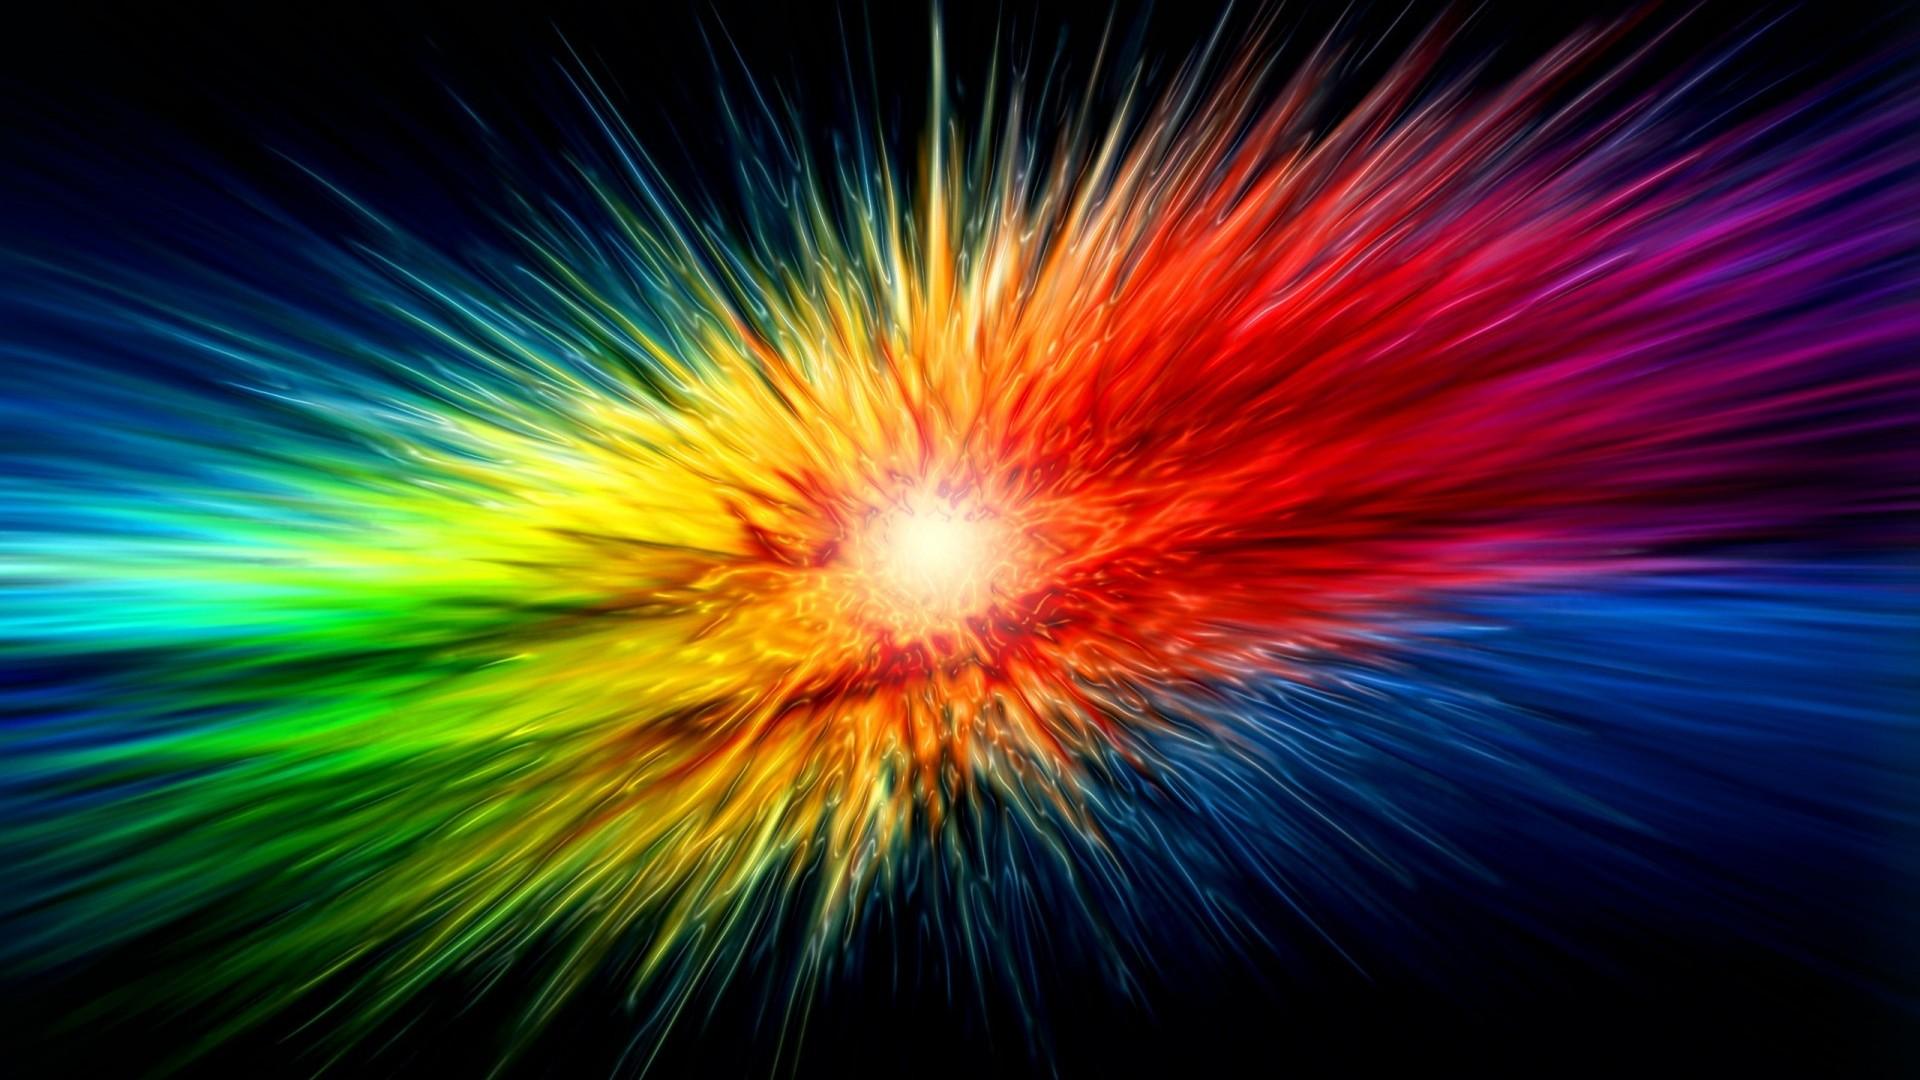 Supernova Rainbow Explosion 1920x1080 HD Image Abstract 3D 1920x1080